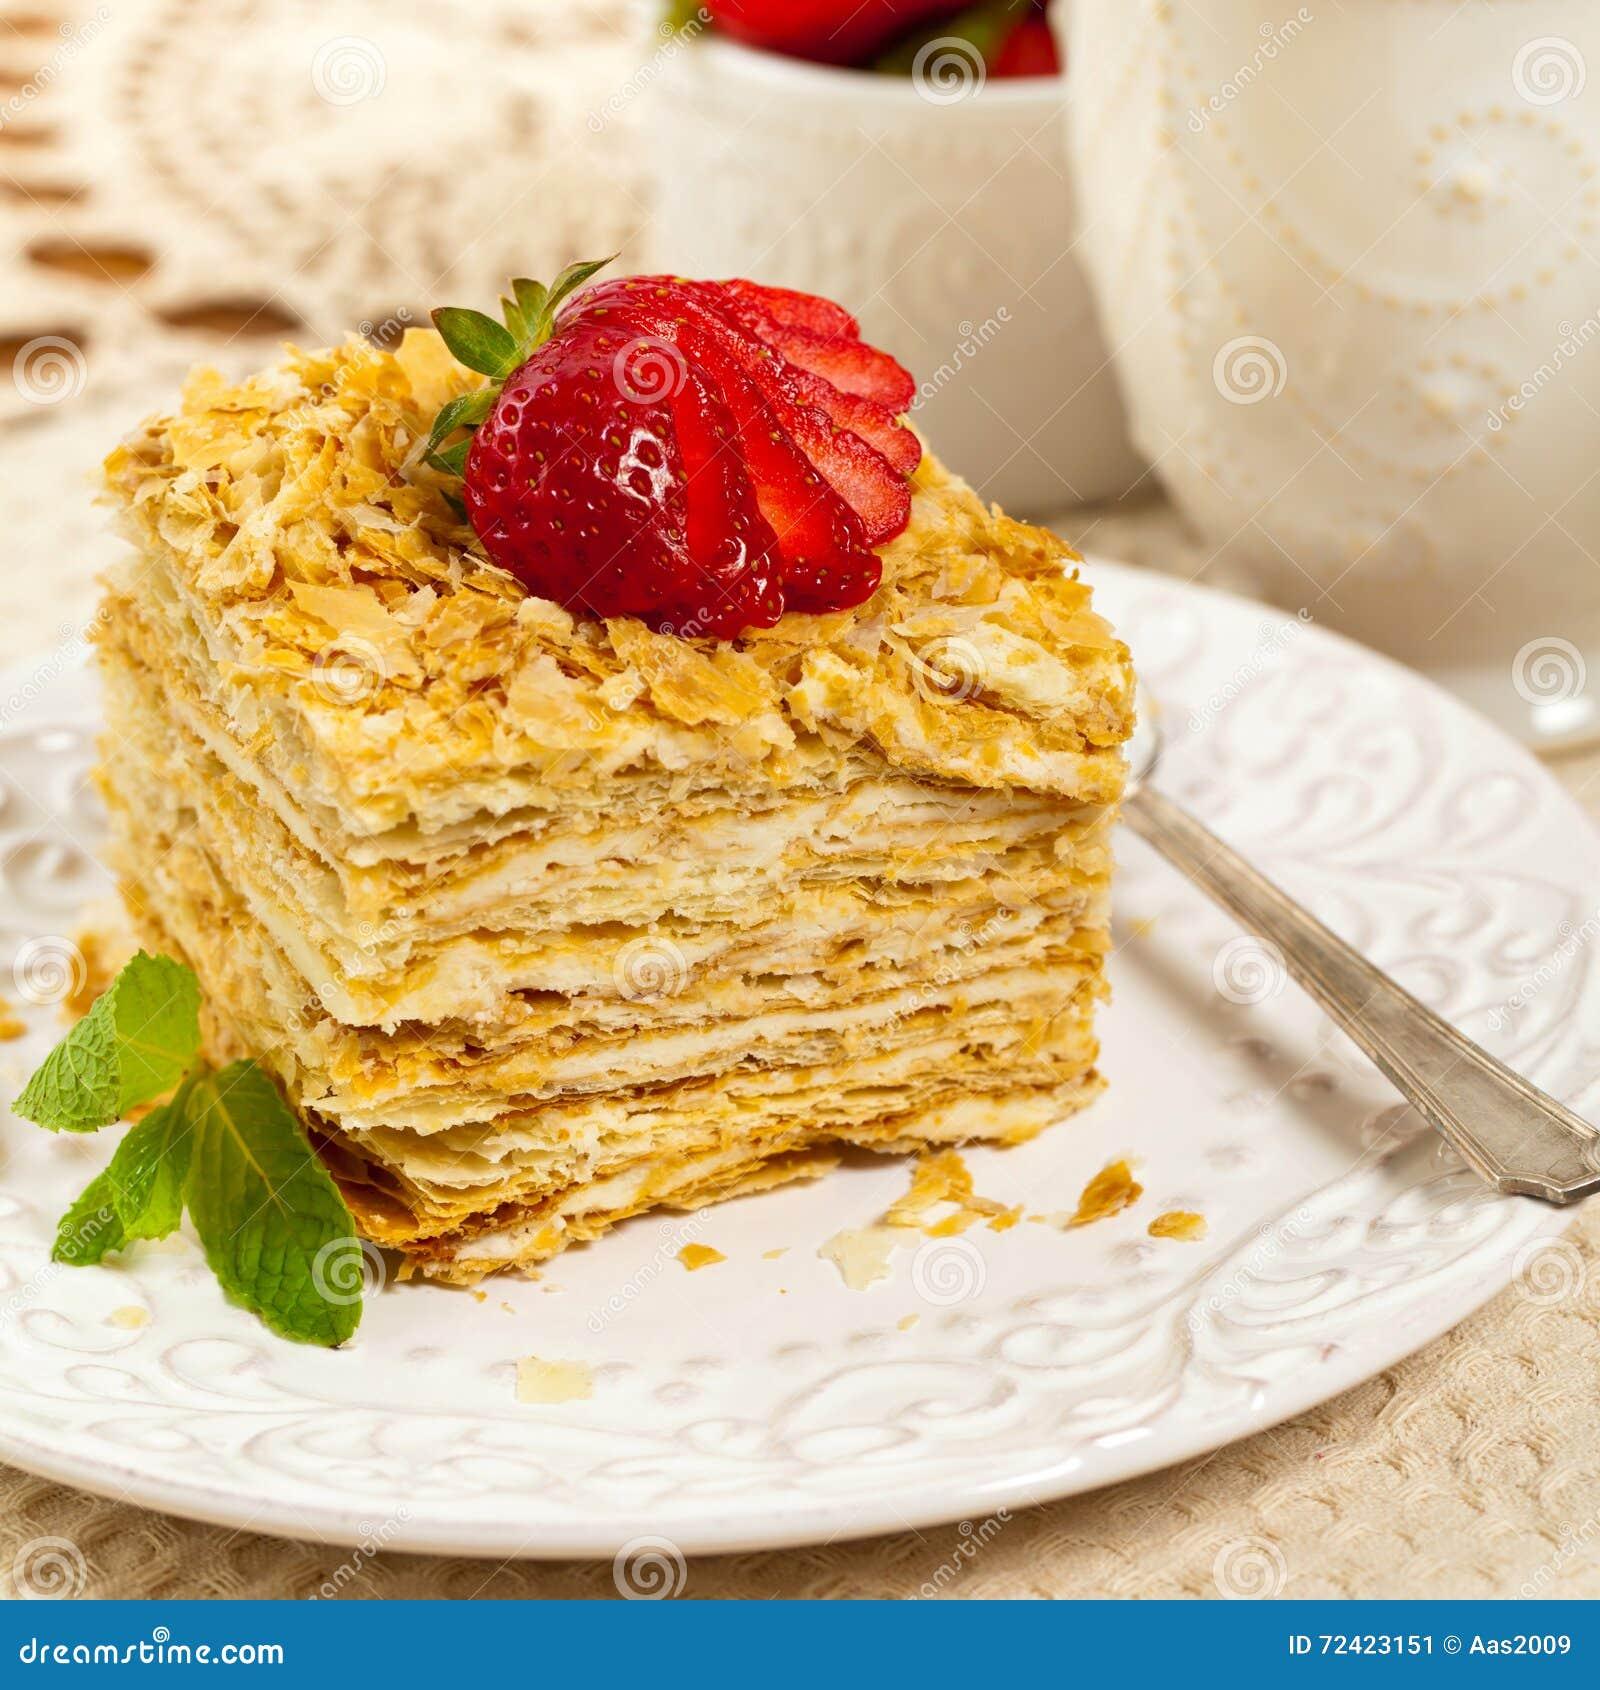 Blatterteig Napoleon Cake Stockbild Bild Von Blatter 72423151